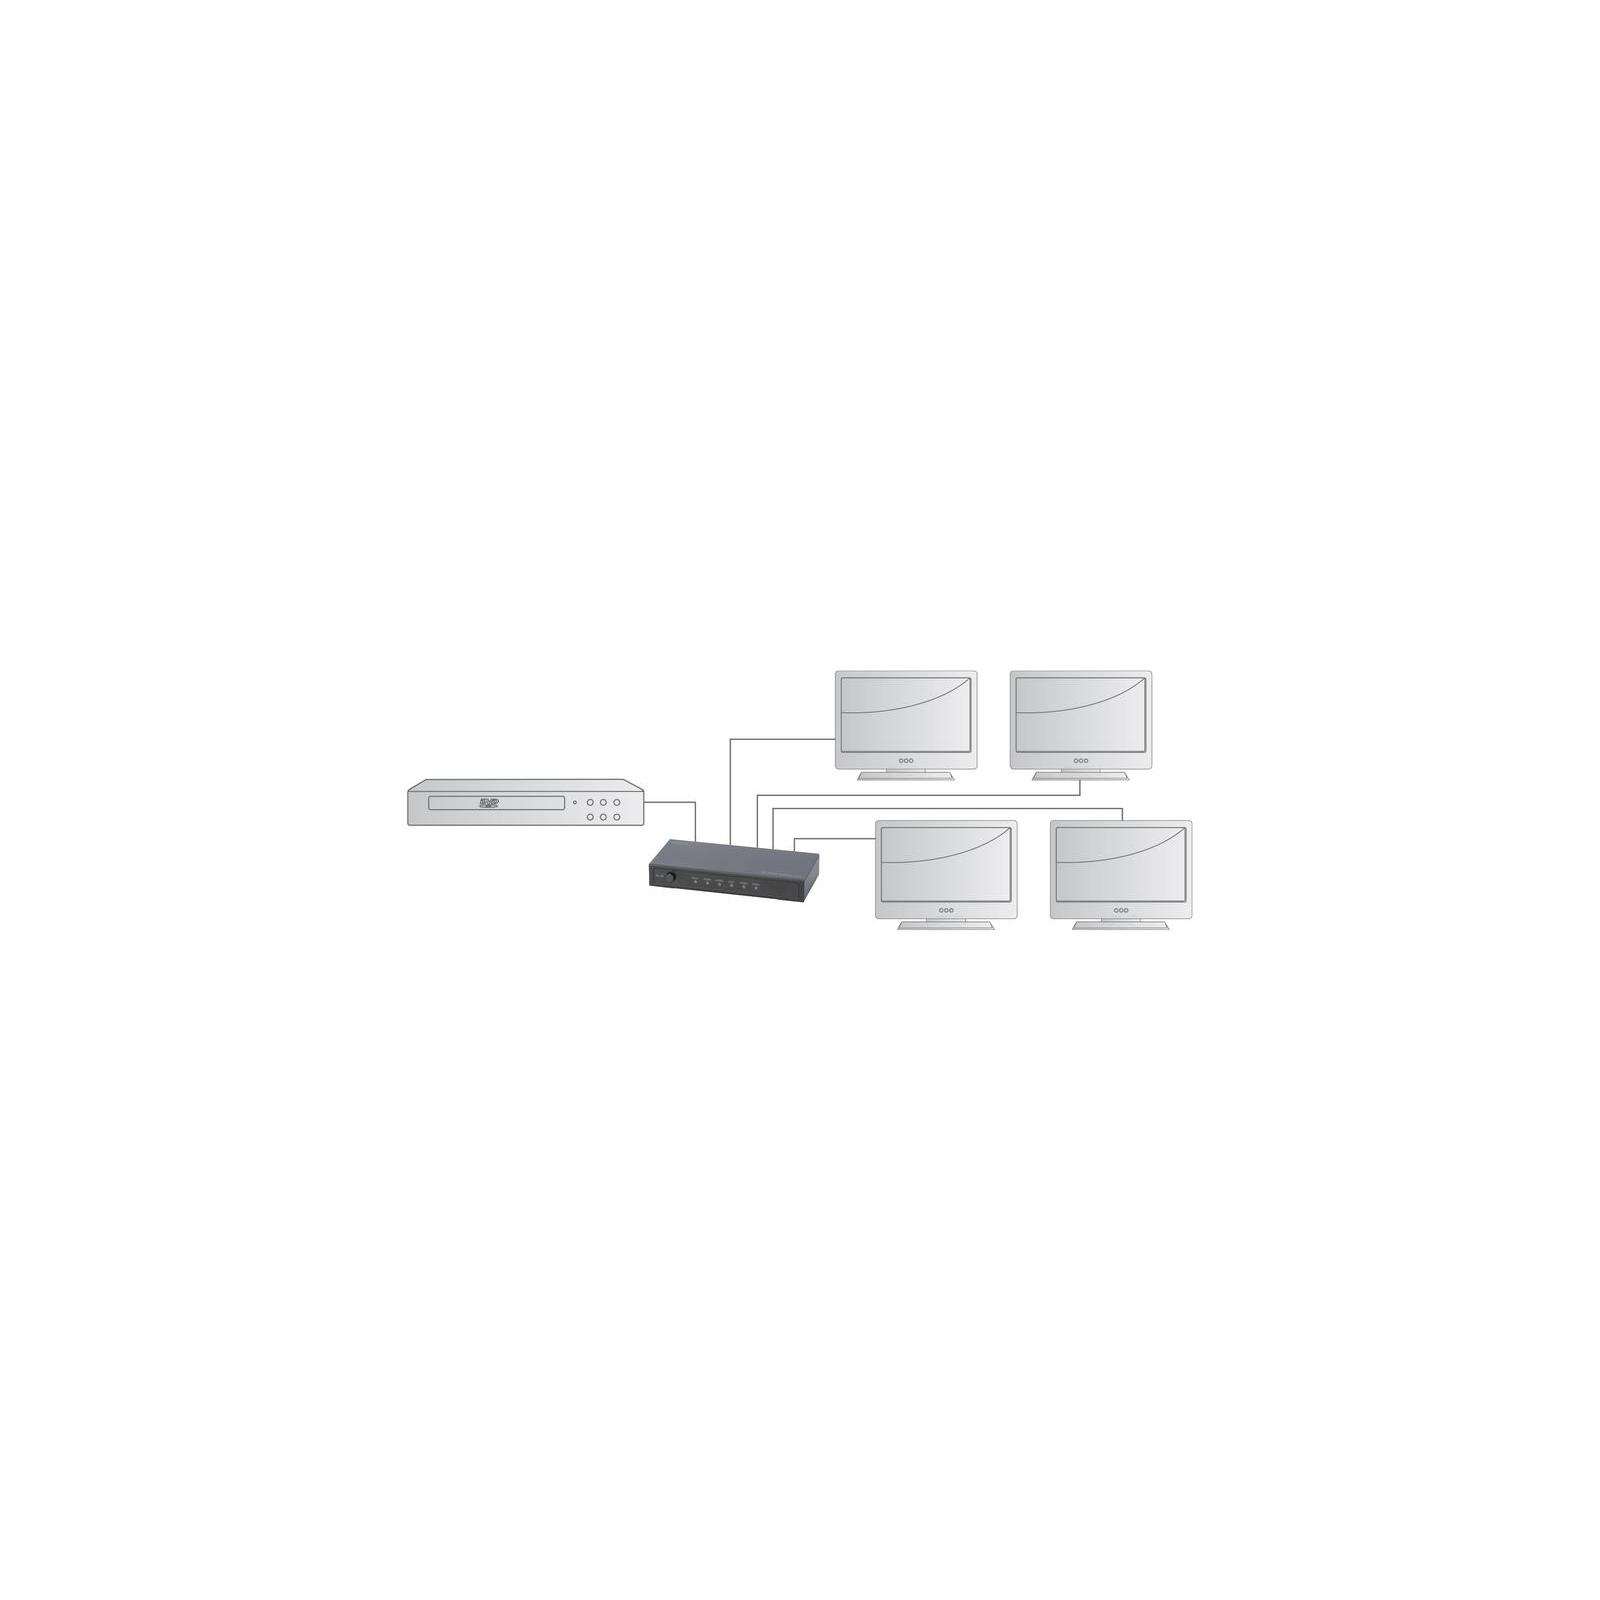 Сплиттер DIGITUS HDMI (INx1 - OUTx4), 4K, black (DS-47304) изображение 4